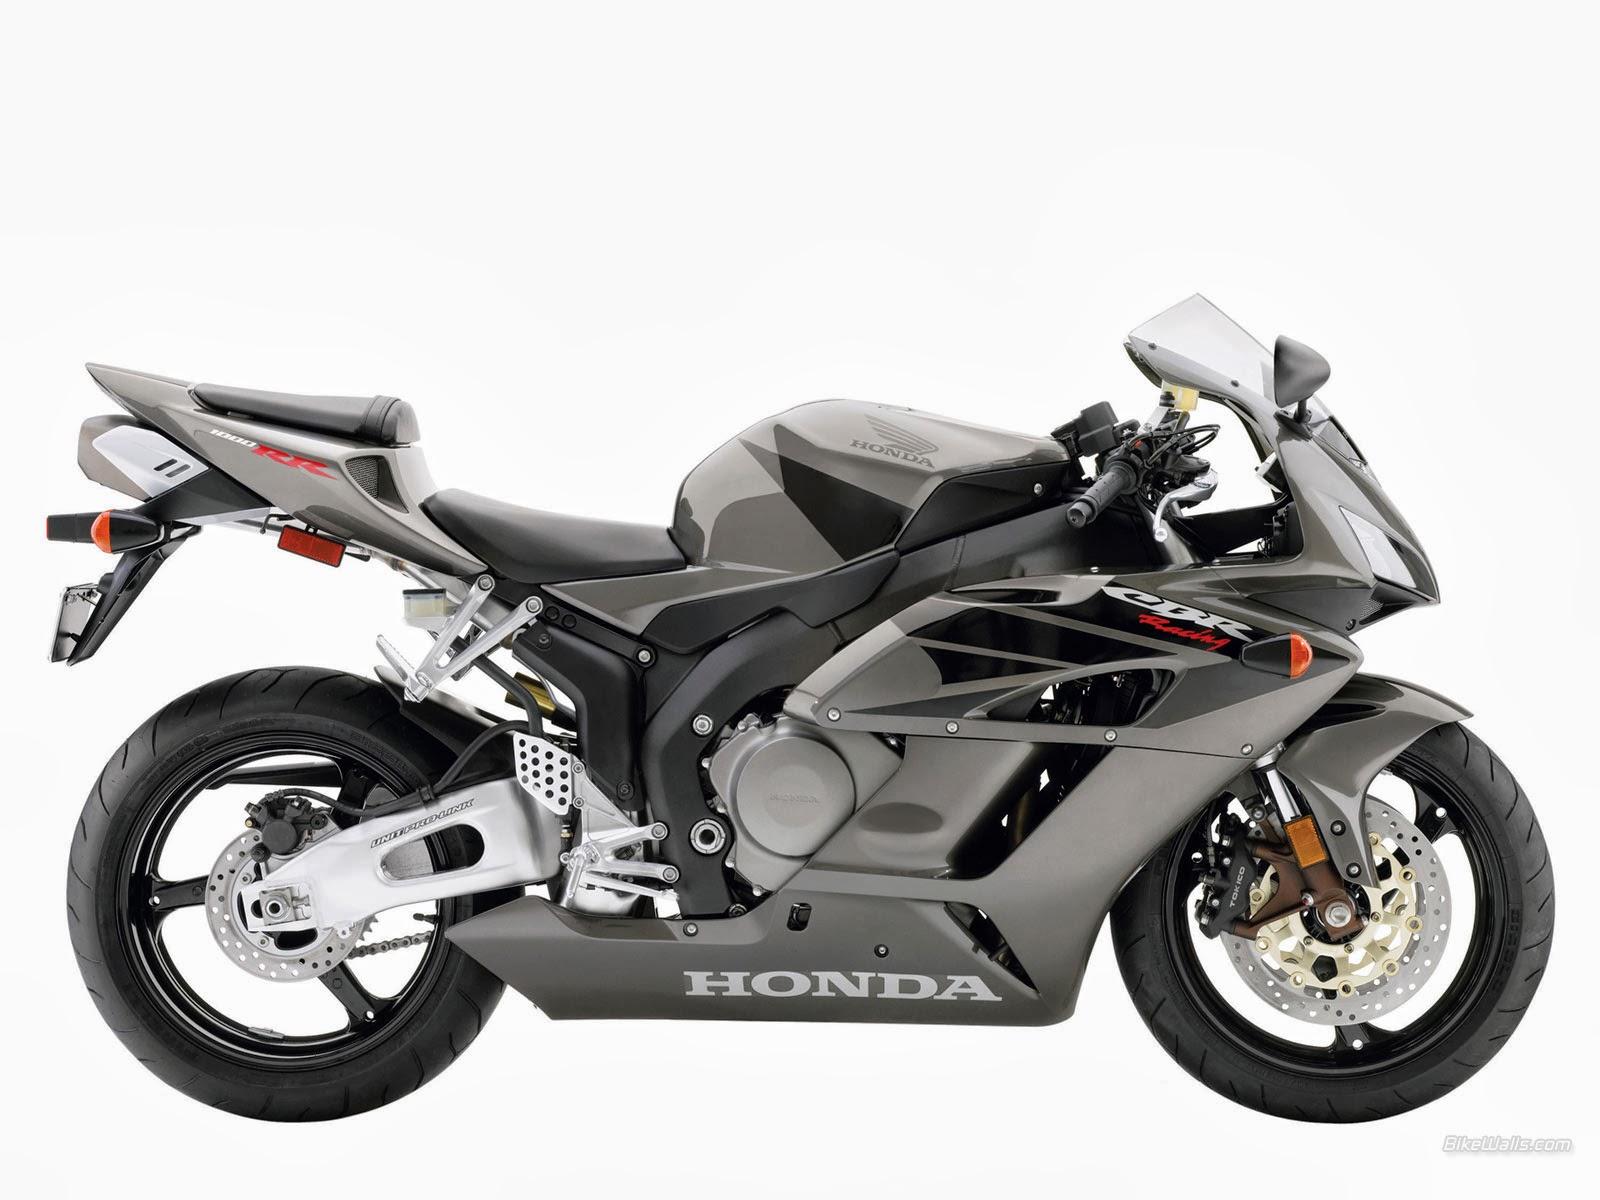 Honda cbr 100 rr honda motor for South motors honda us1